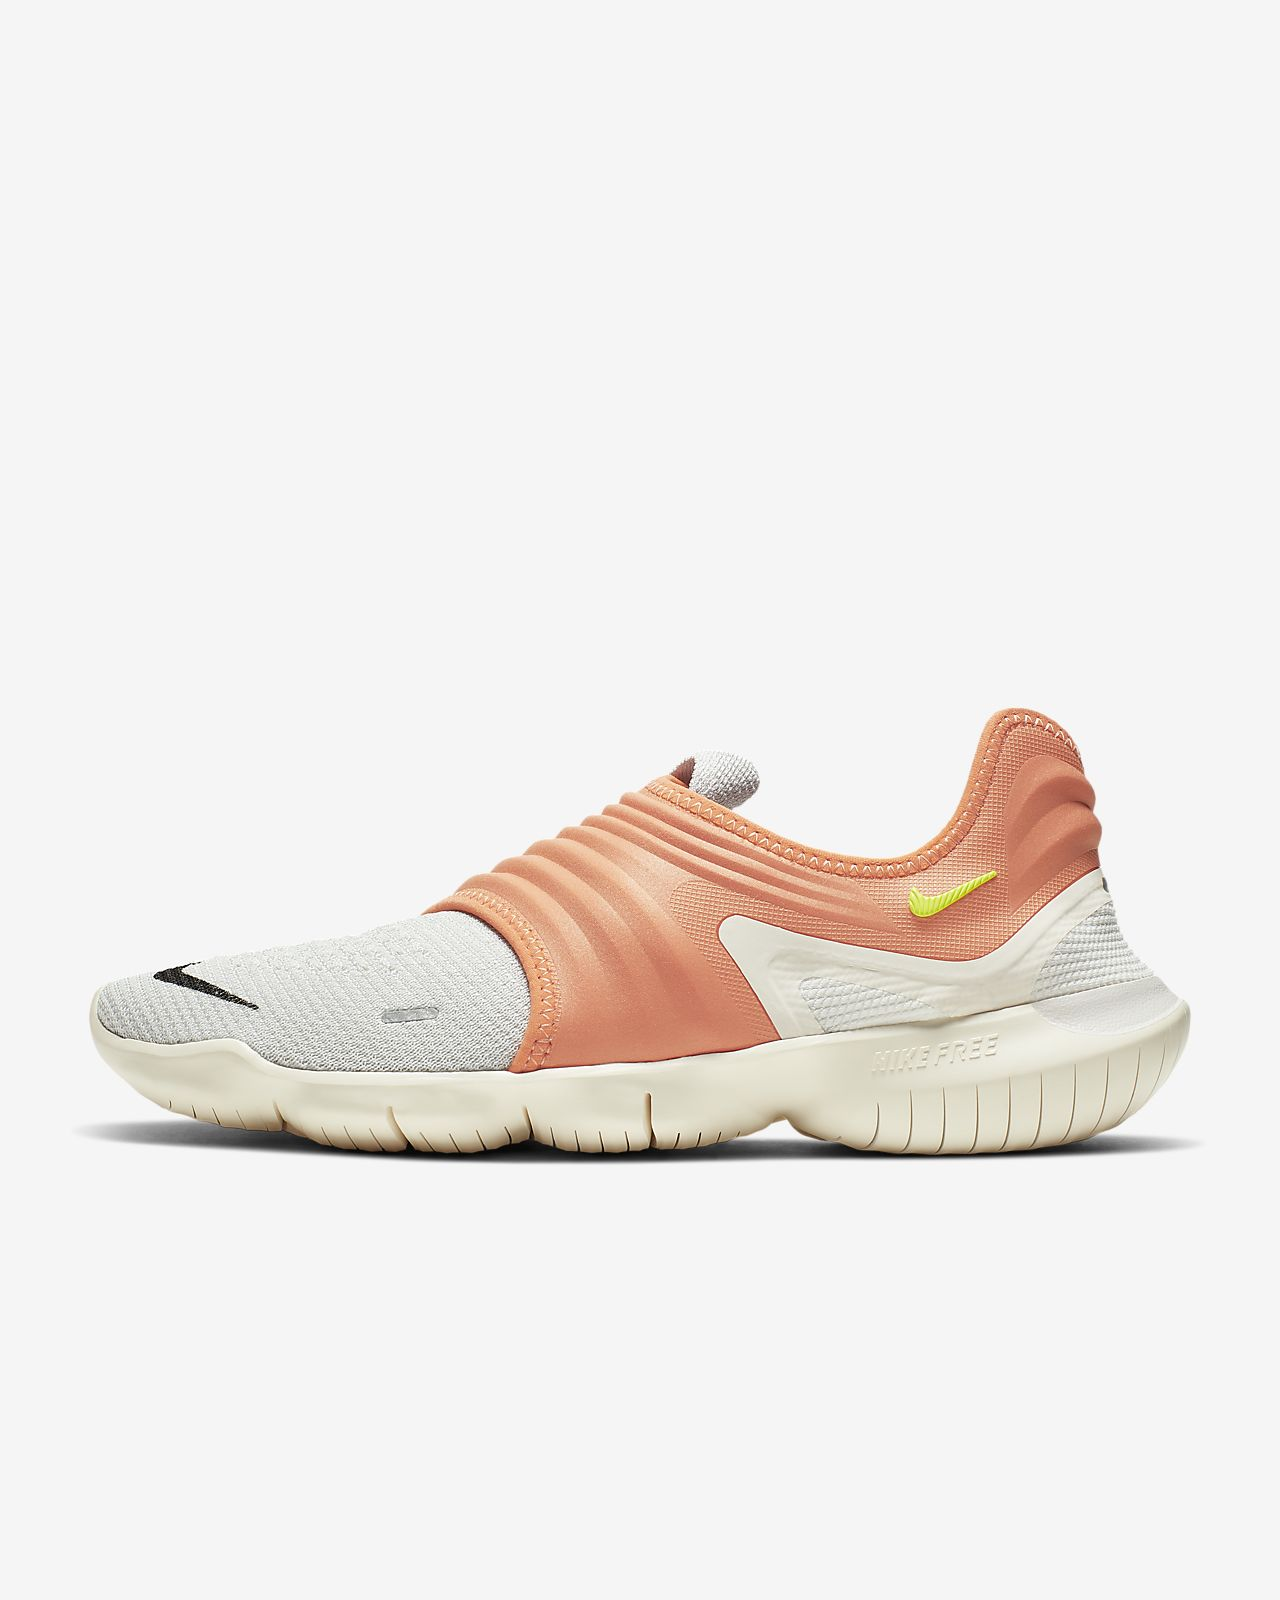 Nike Free RN Flyknit 3.0 NRG Sabatilles de running - Home